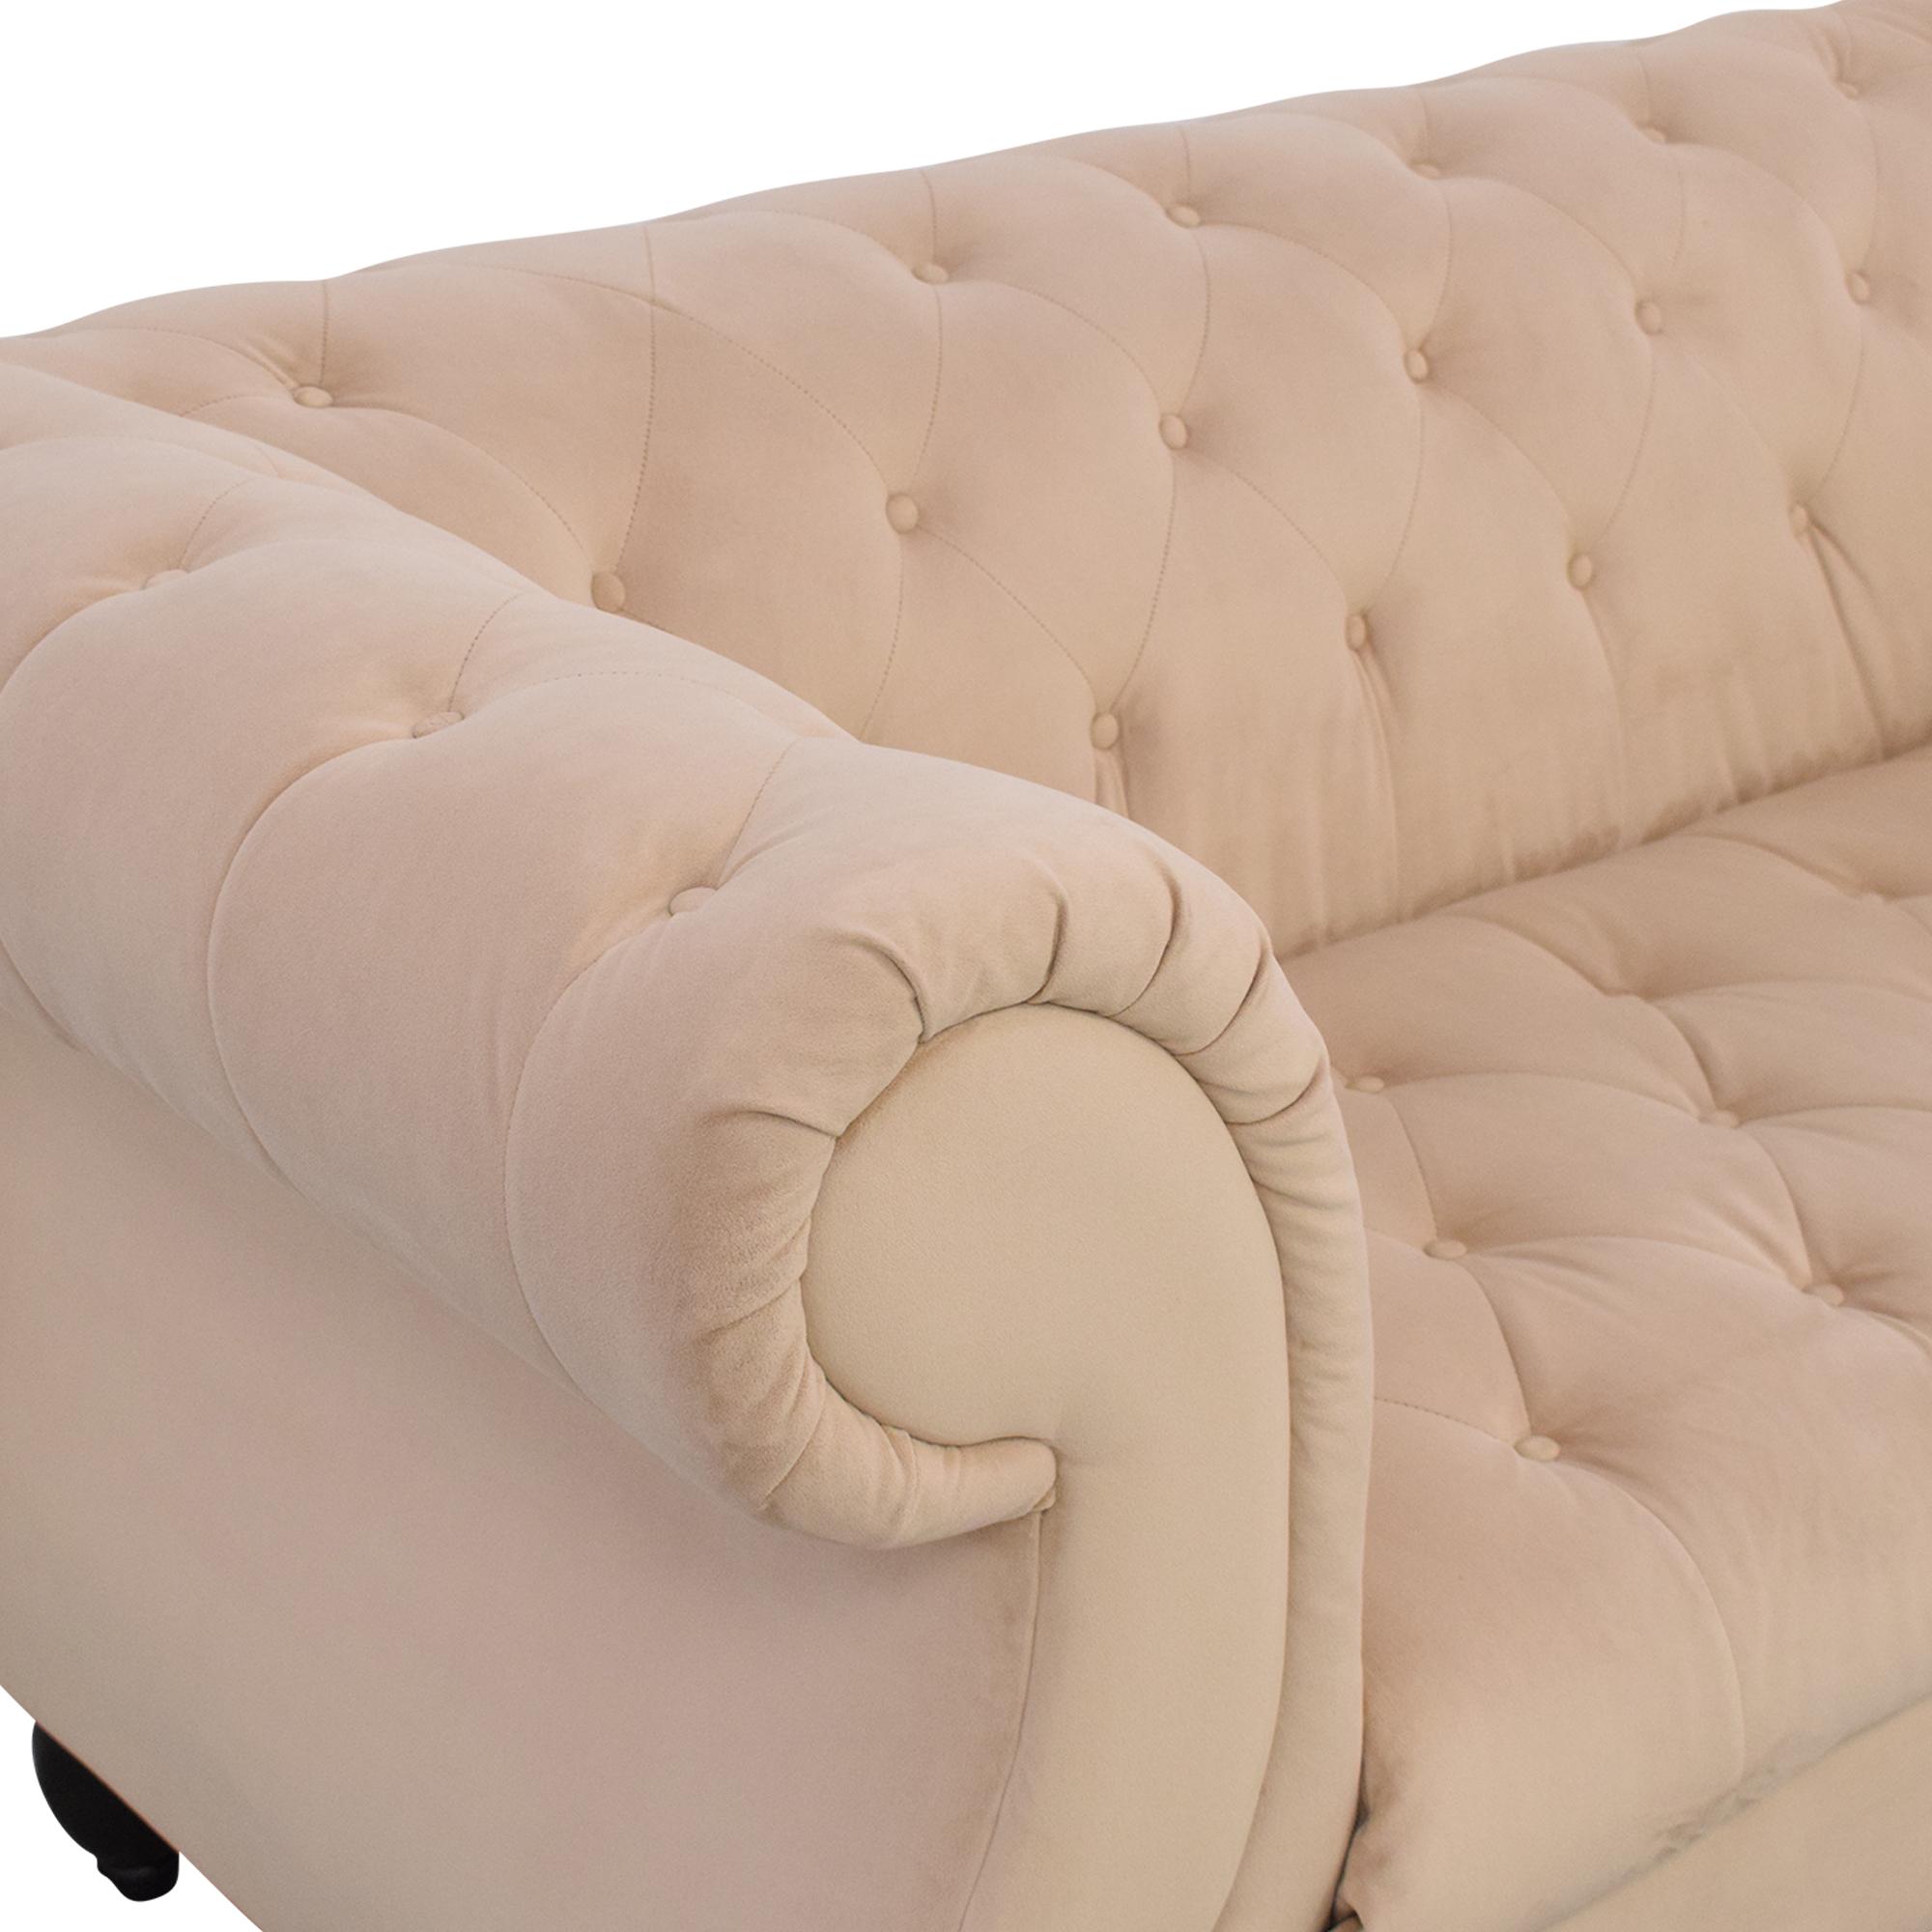 Raymour & Flanigan Raymour & Flanigan Chesterfield Sofa Classic Sofas